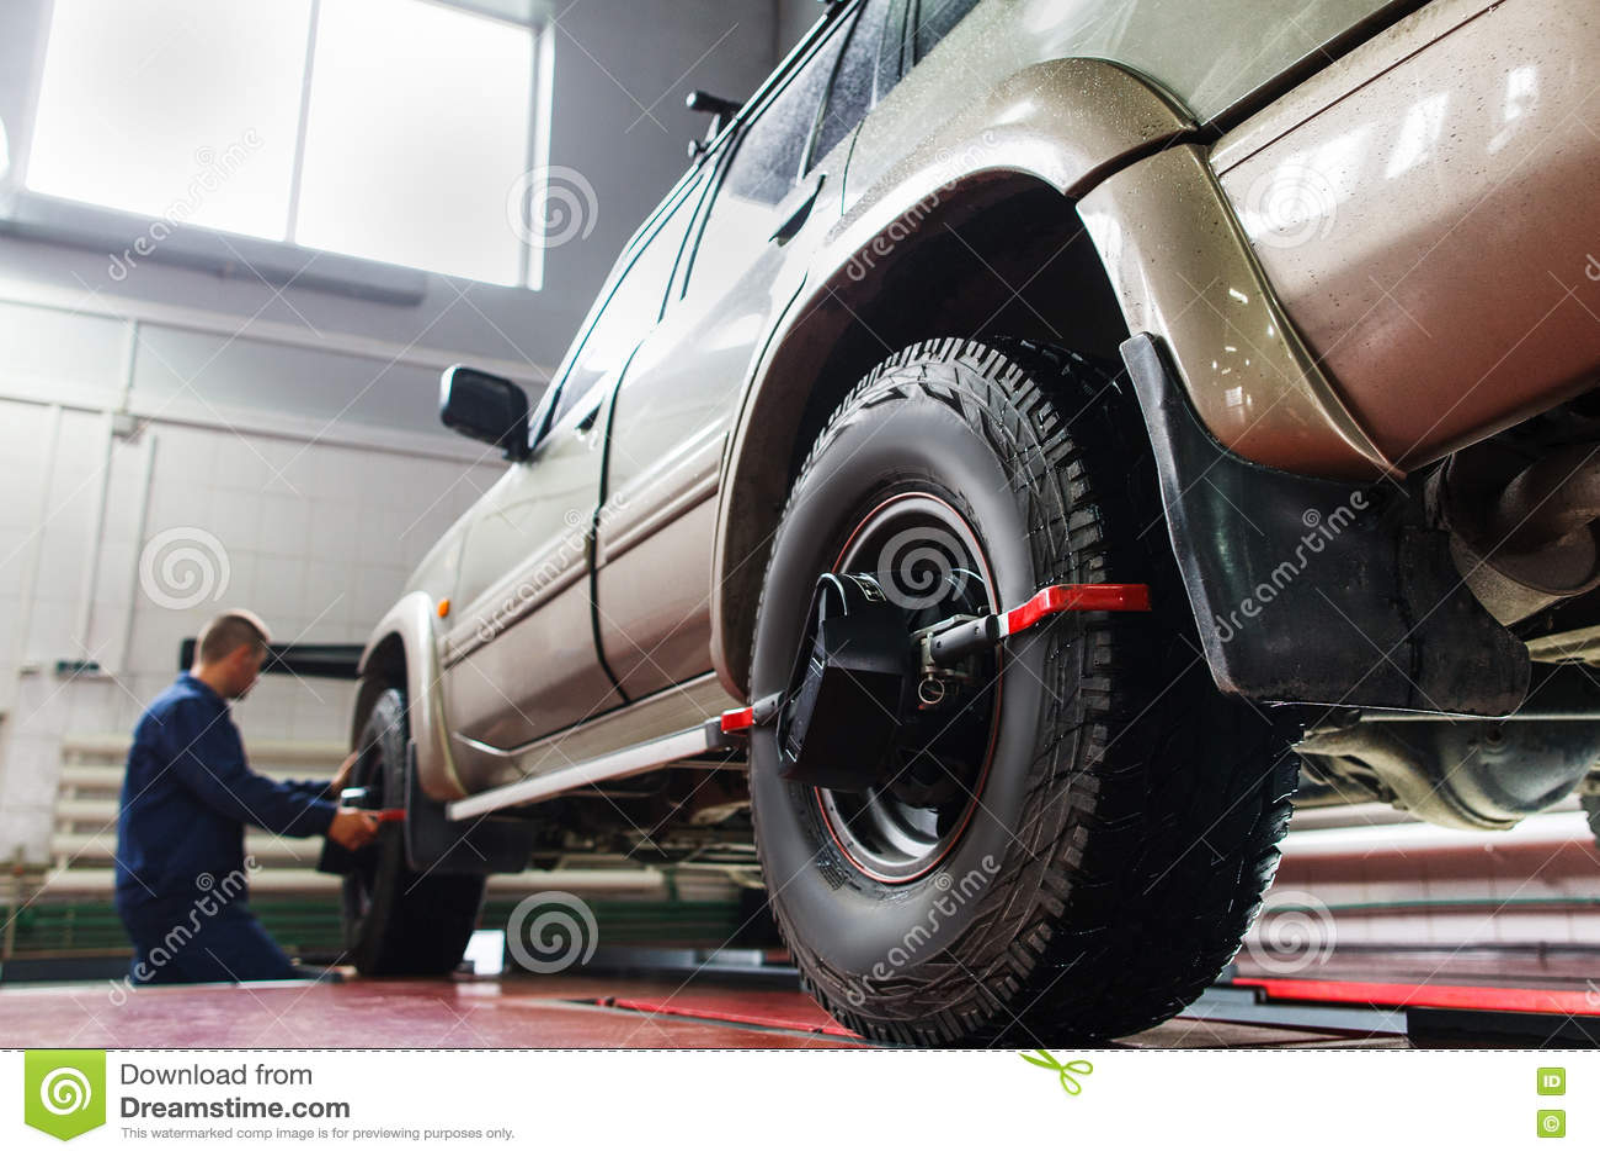 Auto wheel alignment in garage suv maintenance stock for Garage villeneuve auto service